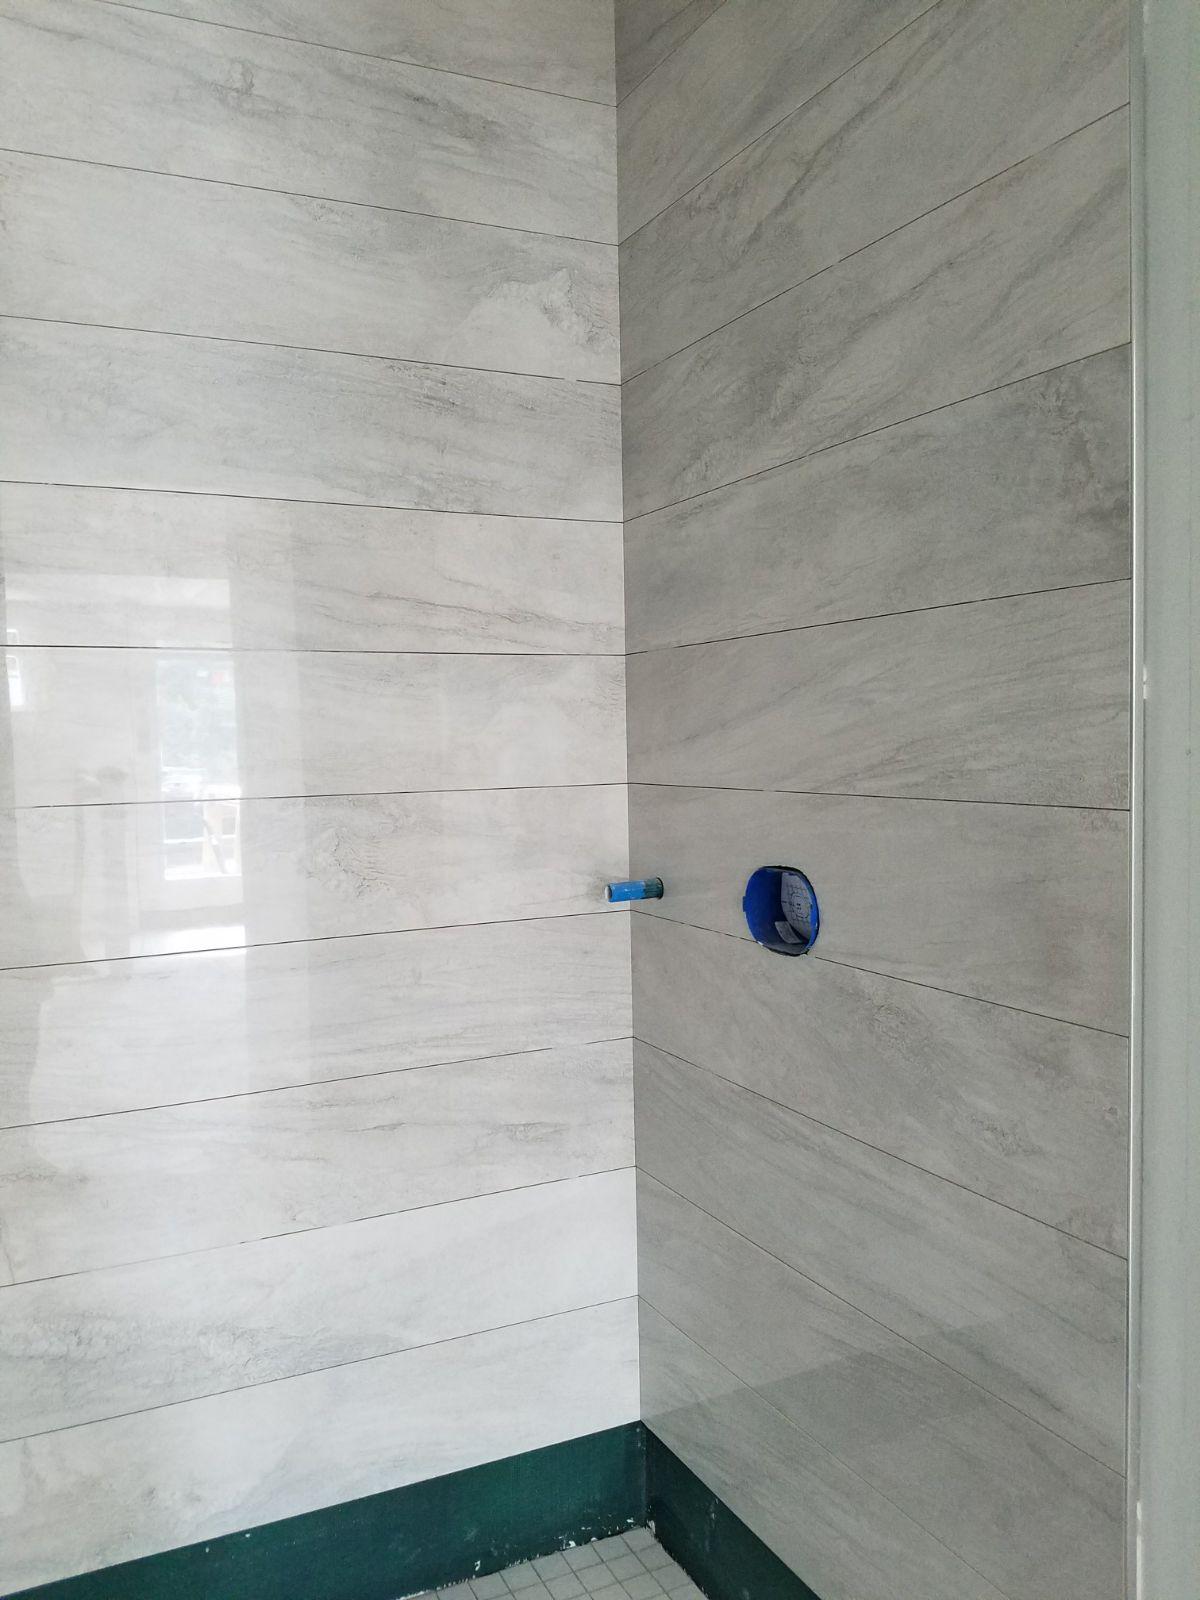 Bathroom 8.36.10 PM (1).jpeg